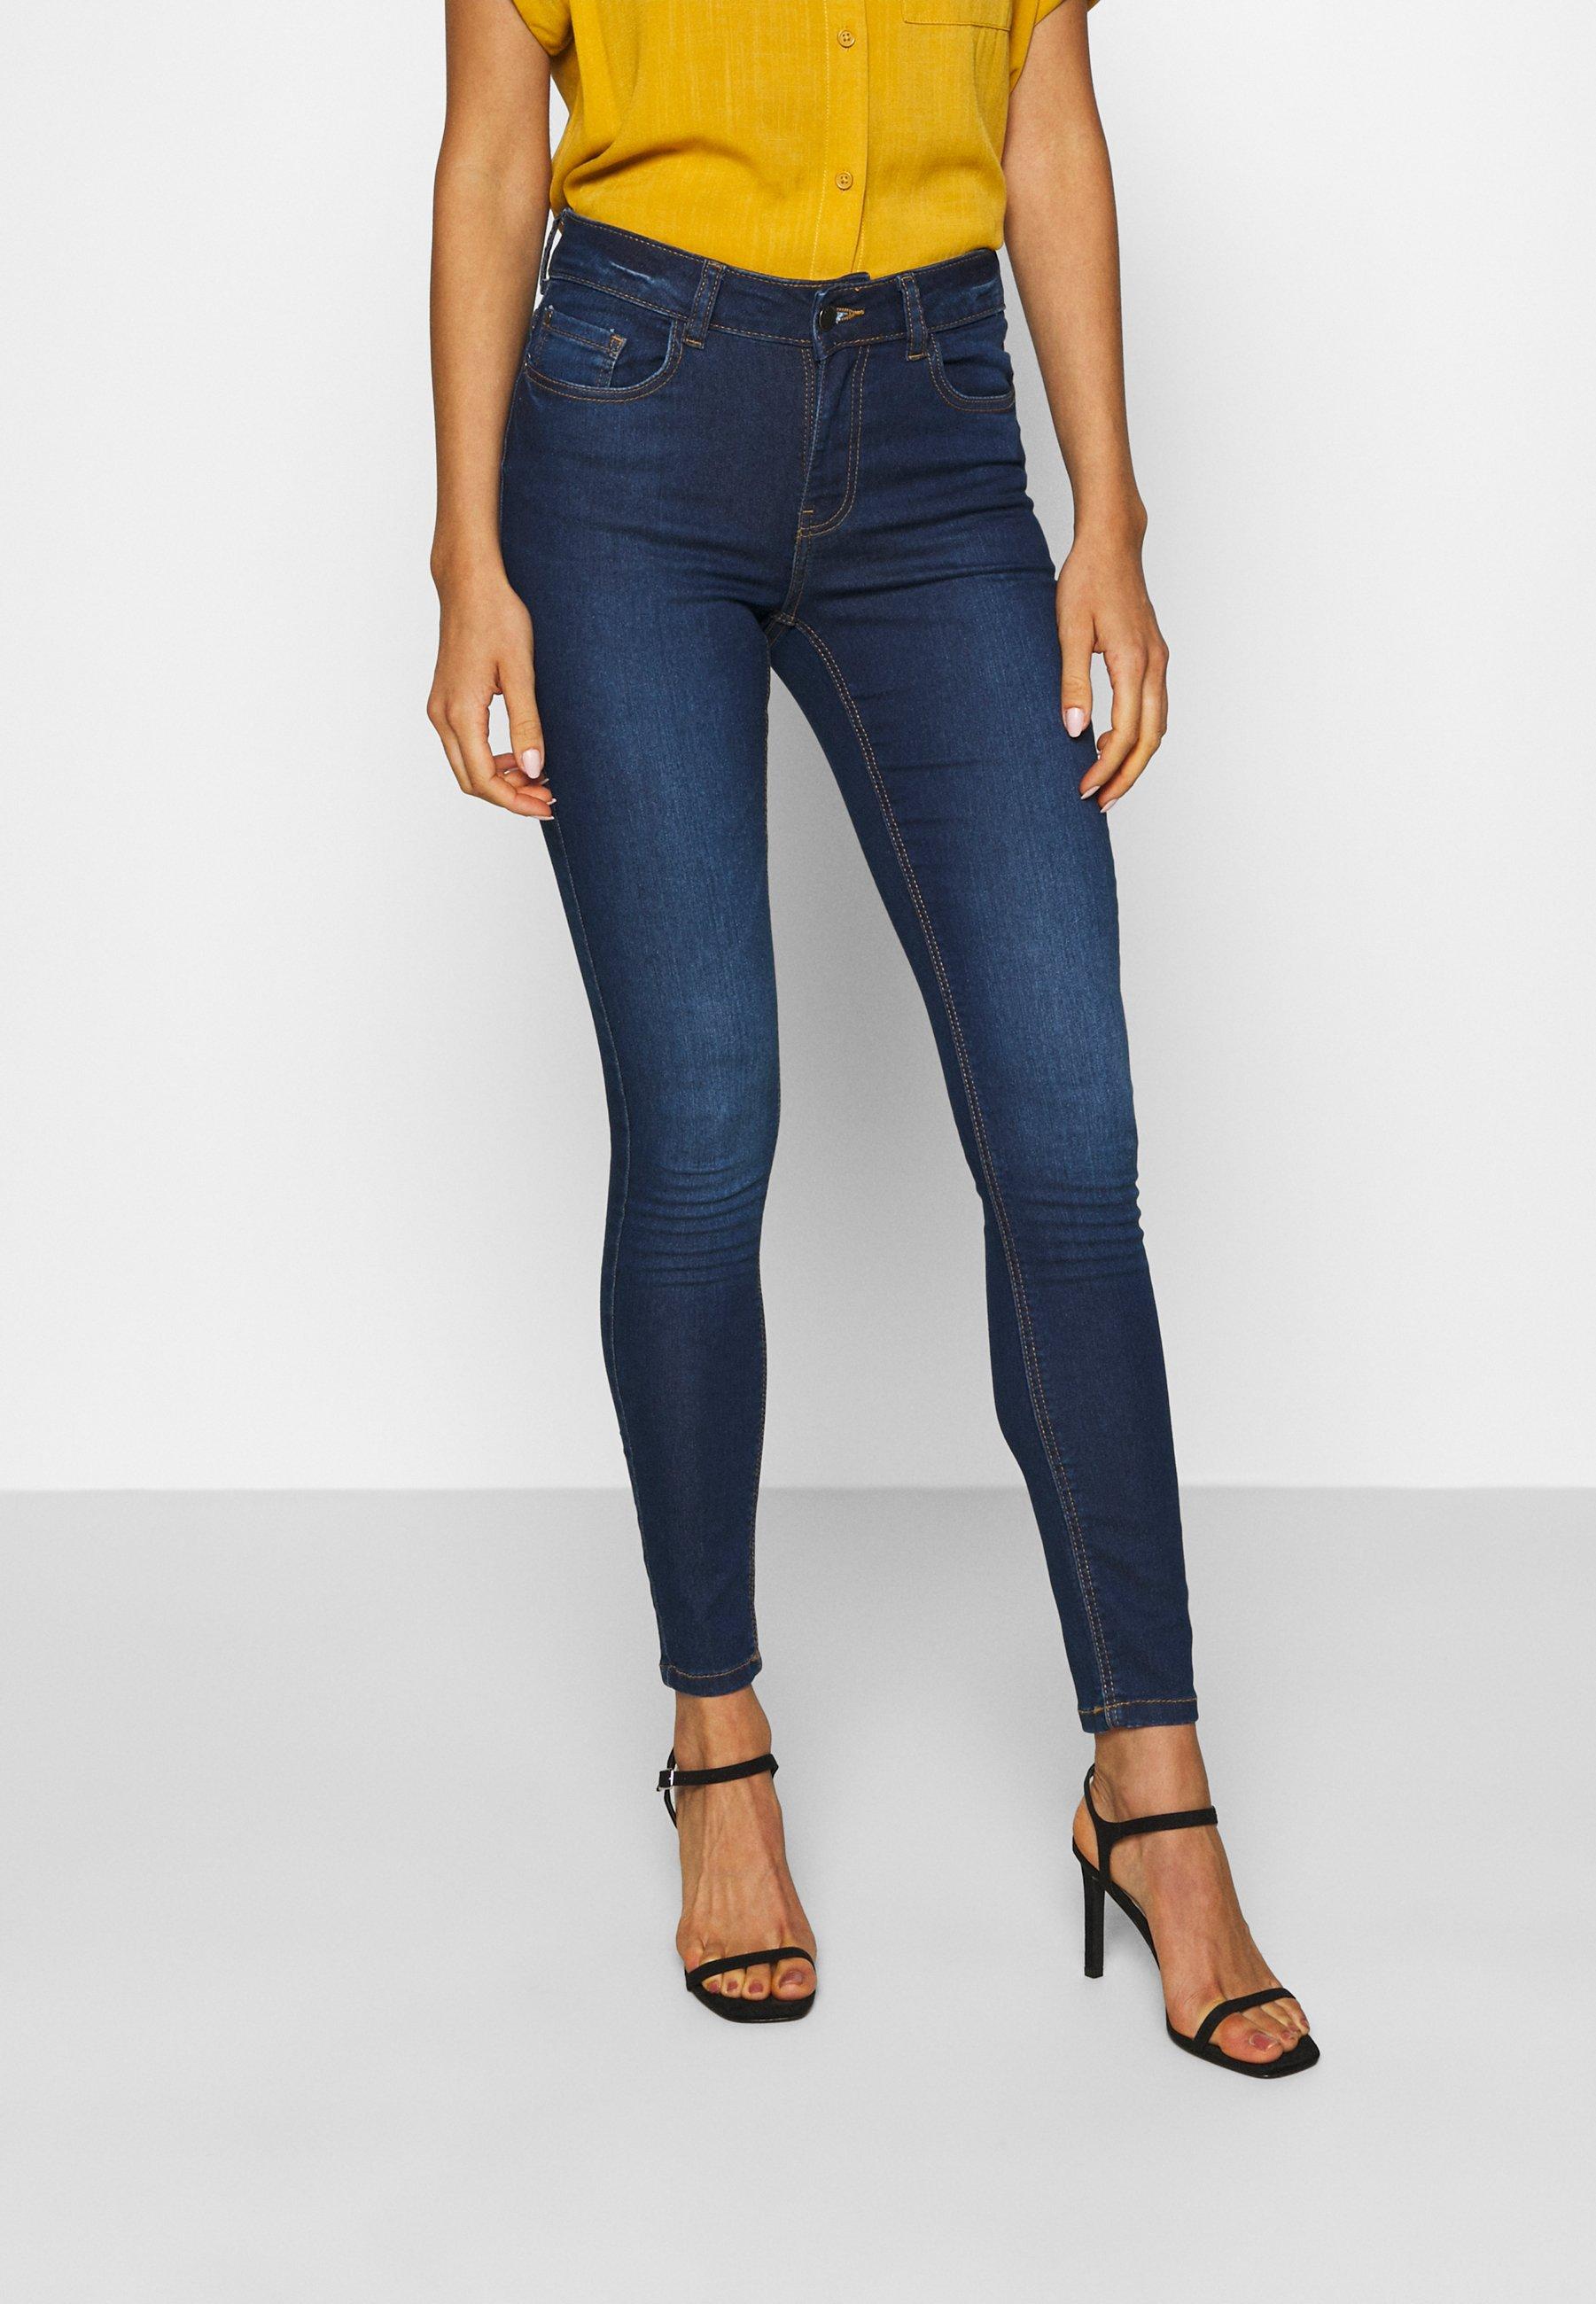 Femme JDYNEWNIKKI LIFE - Jeans Skinny